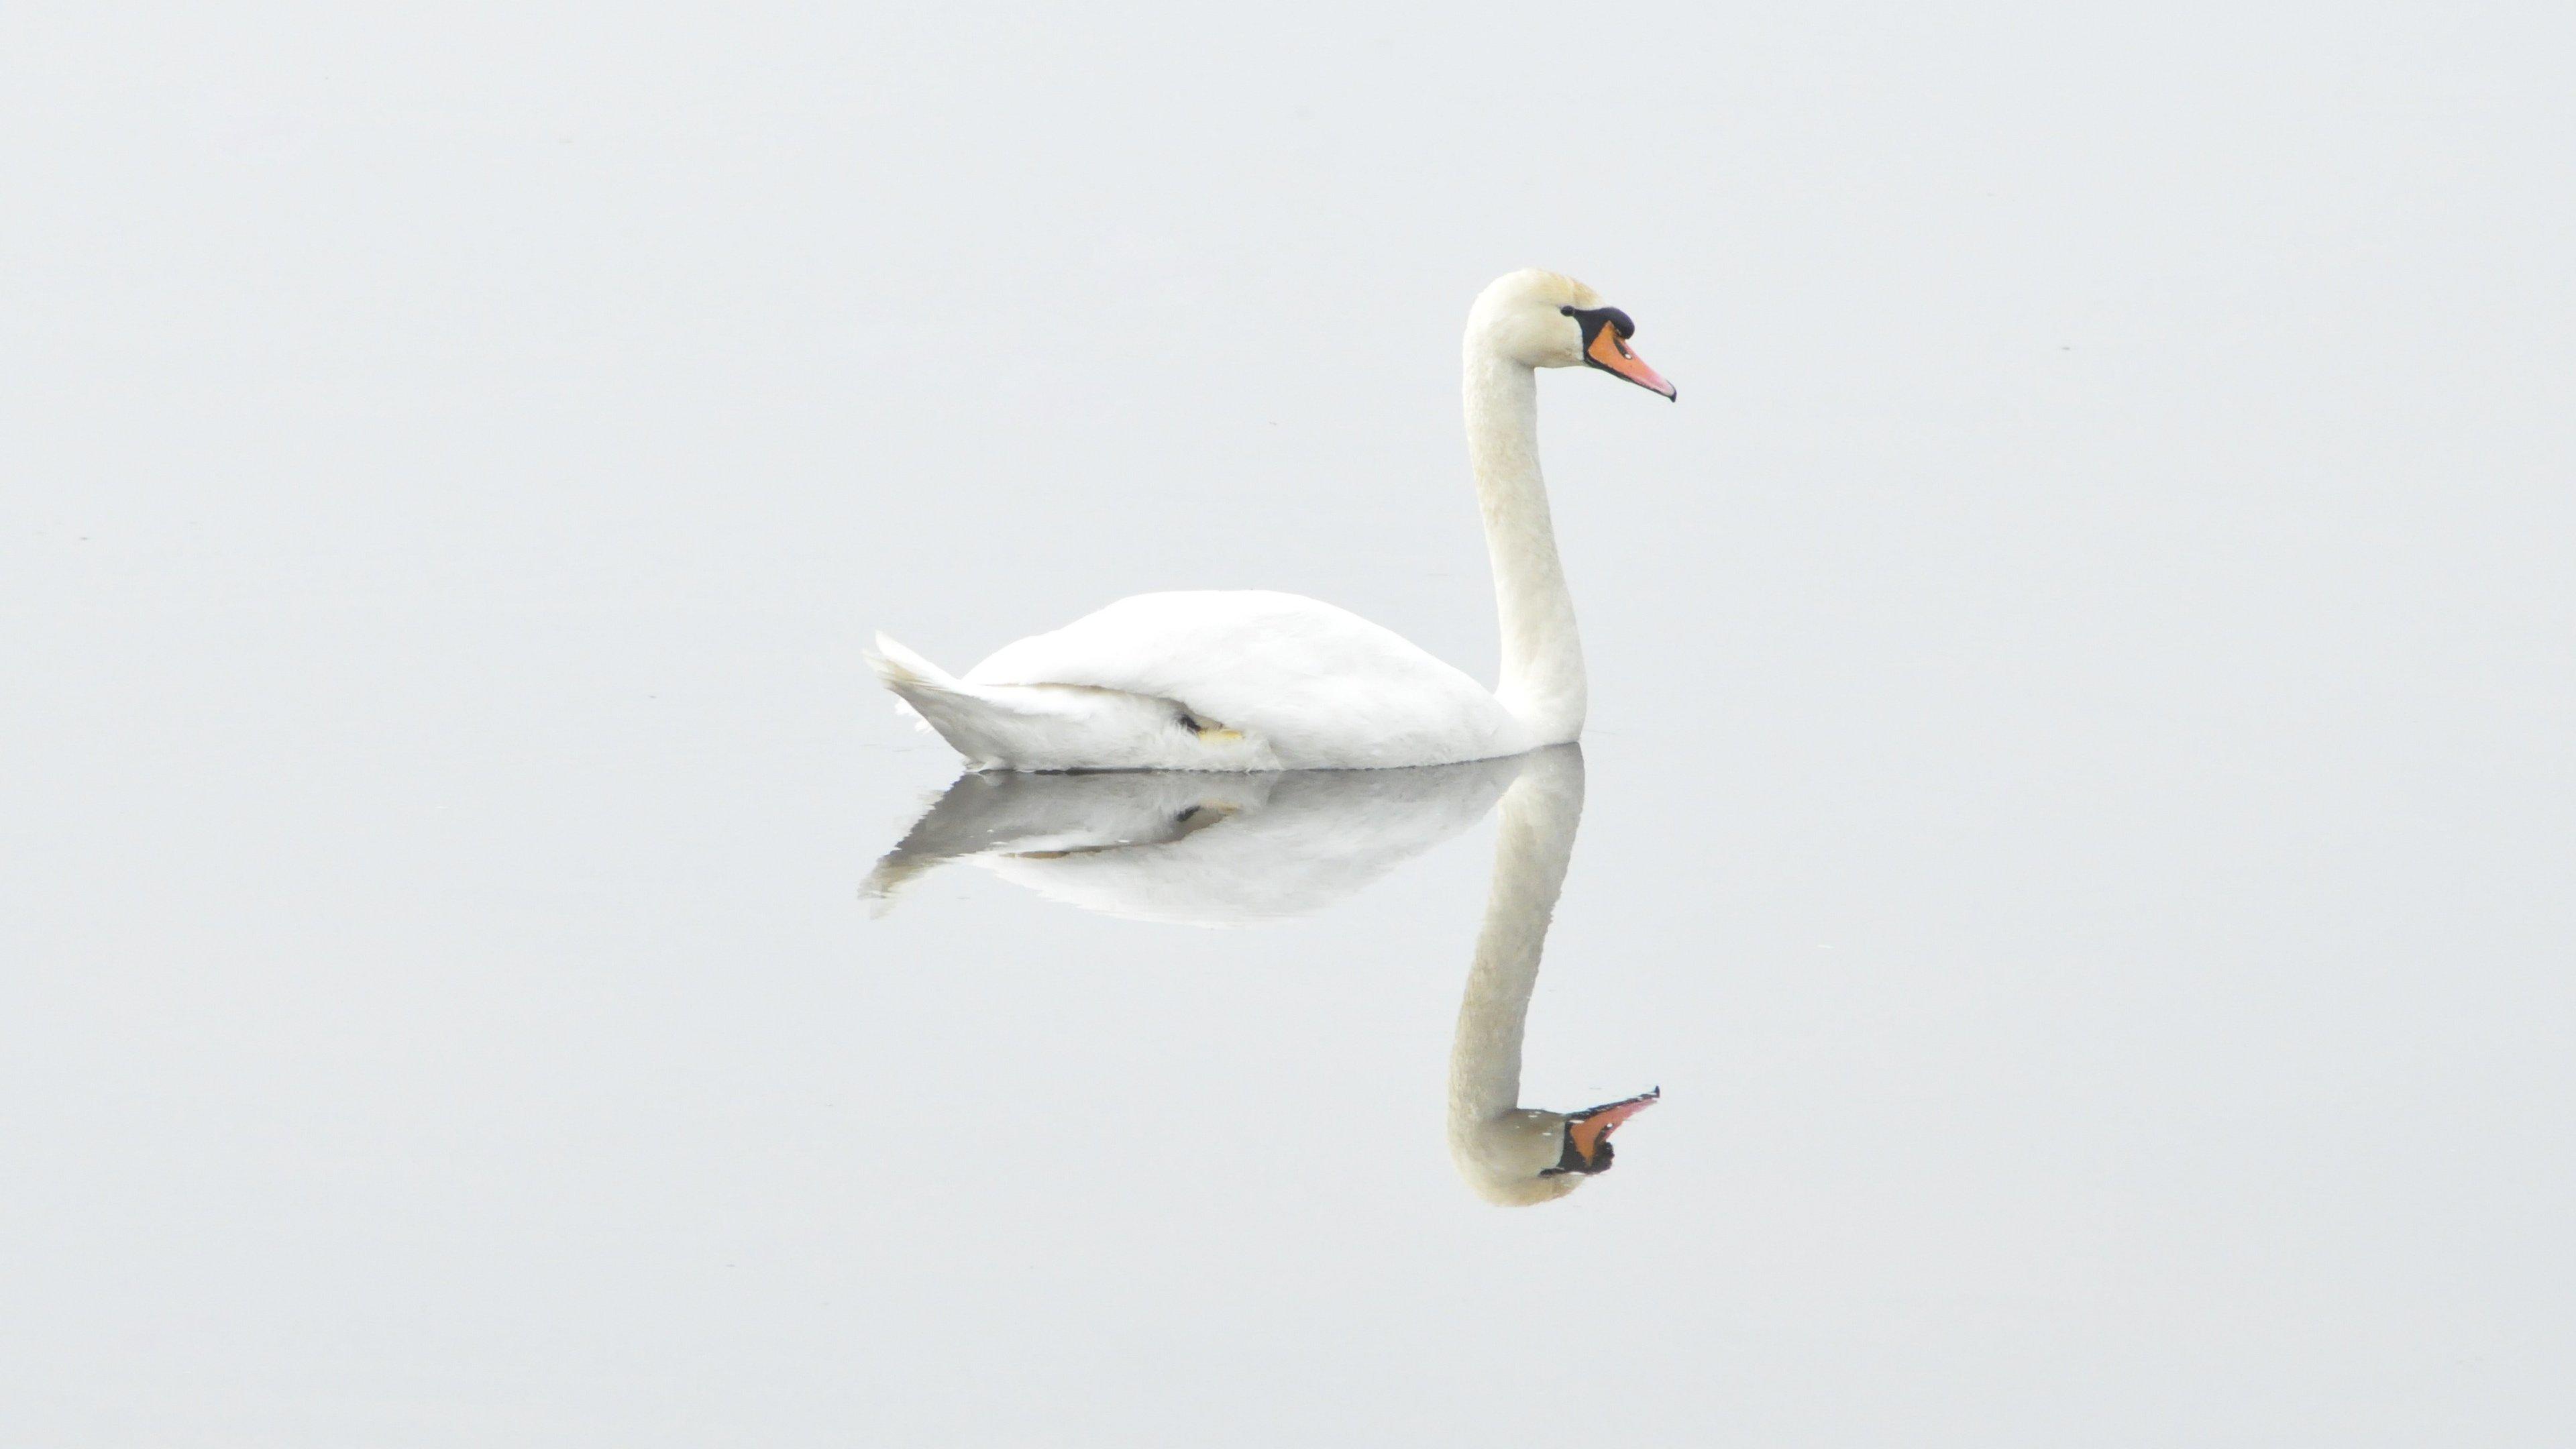 White swan on water wallpaper mobile desktop background - Swan wallpapers for desktop ...